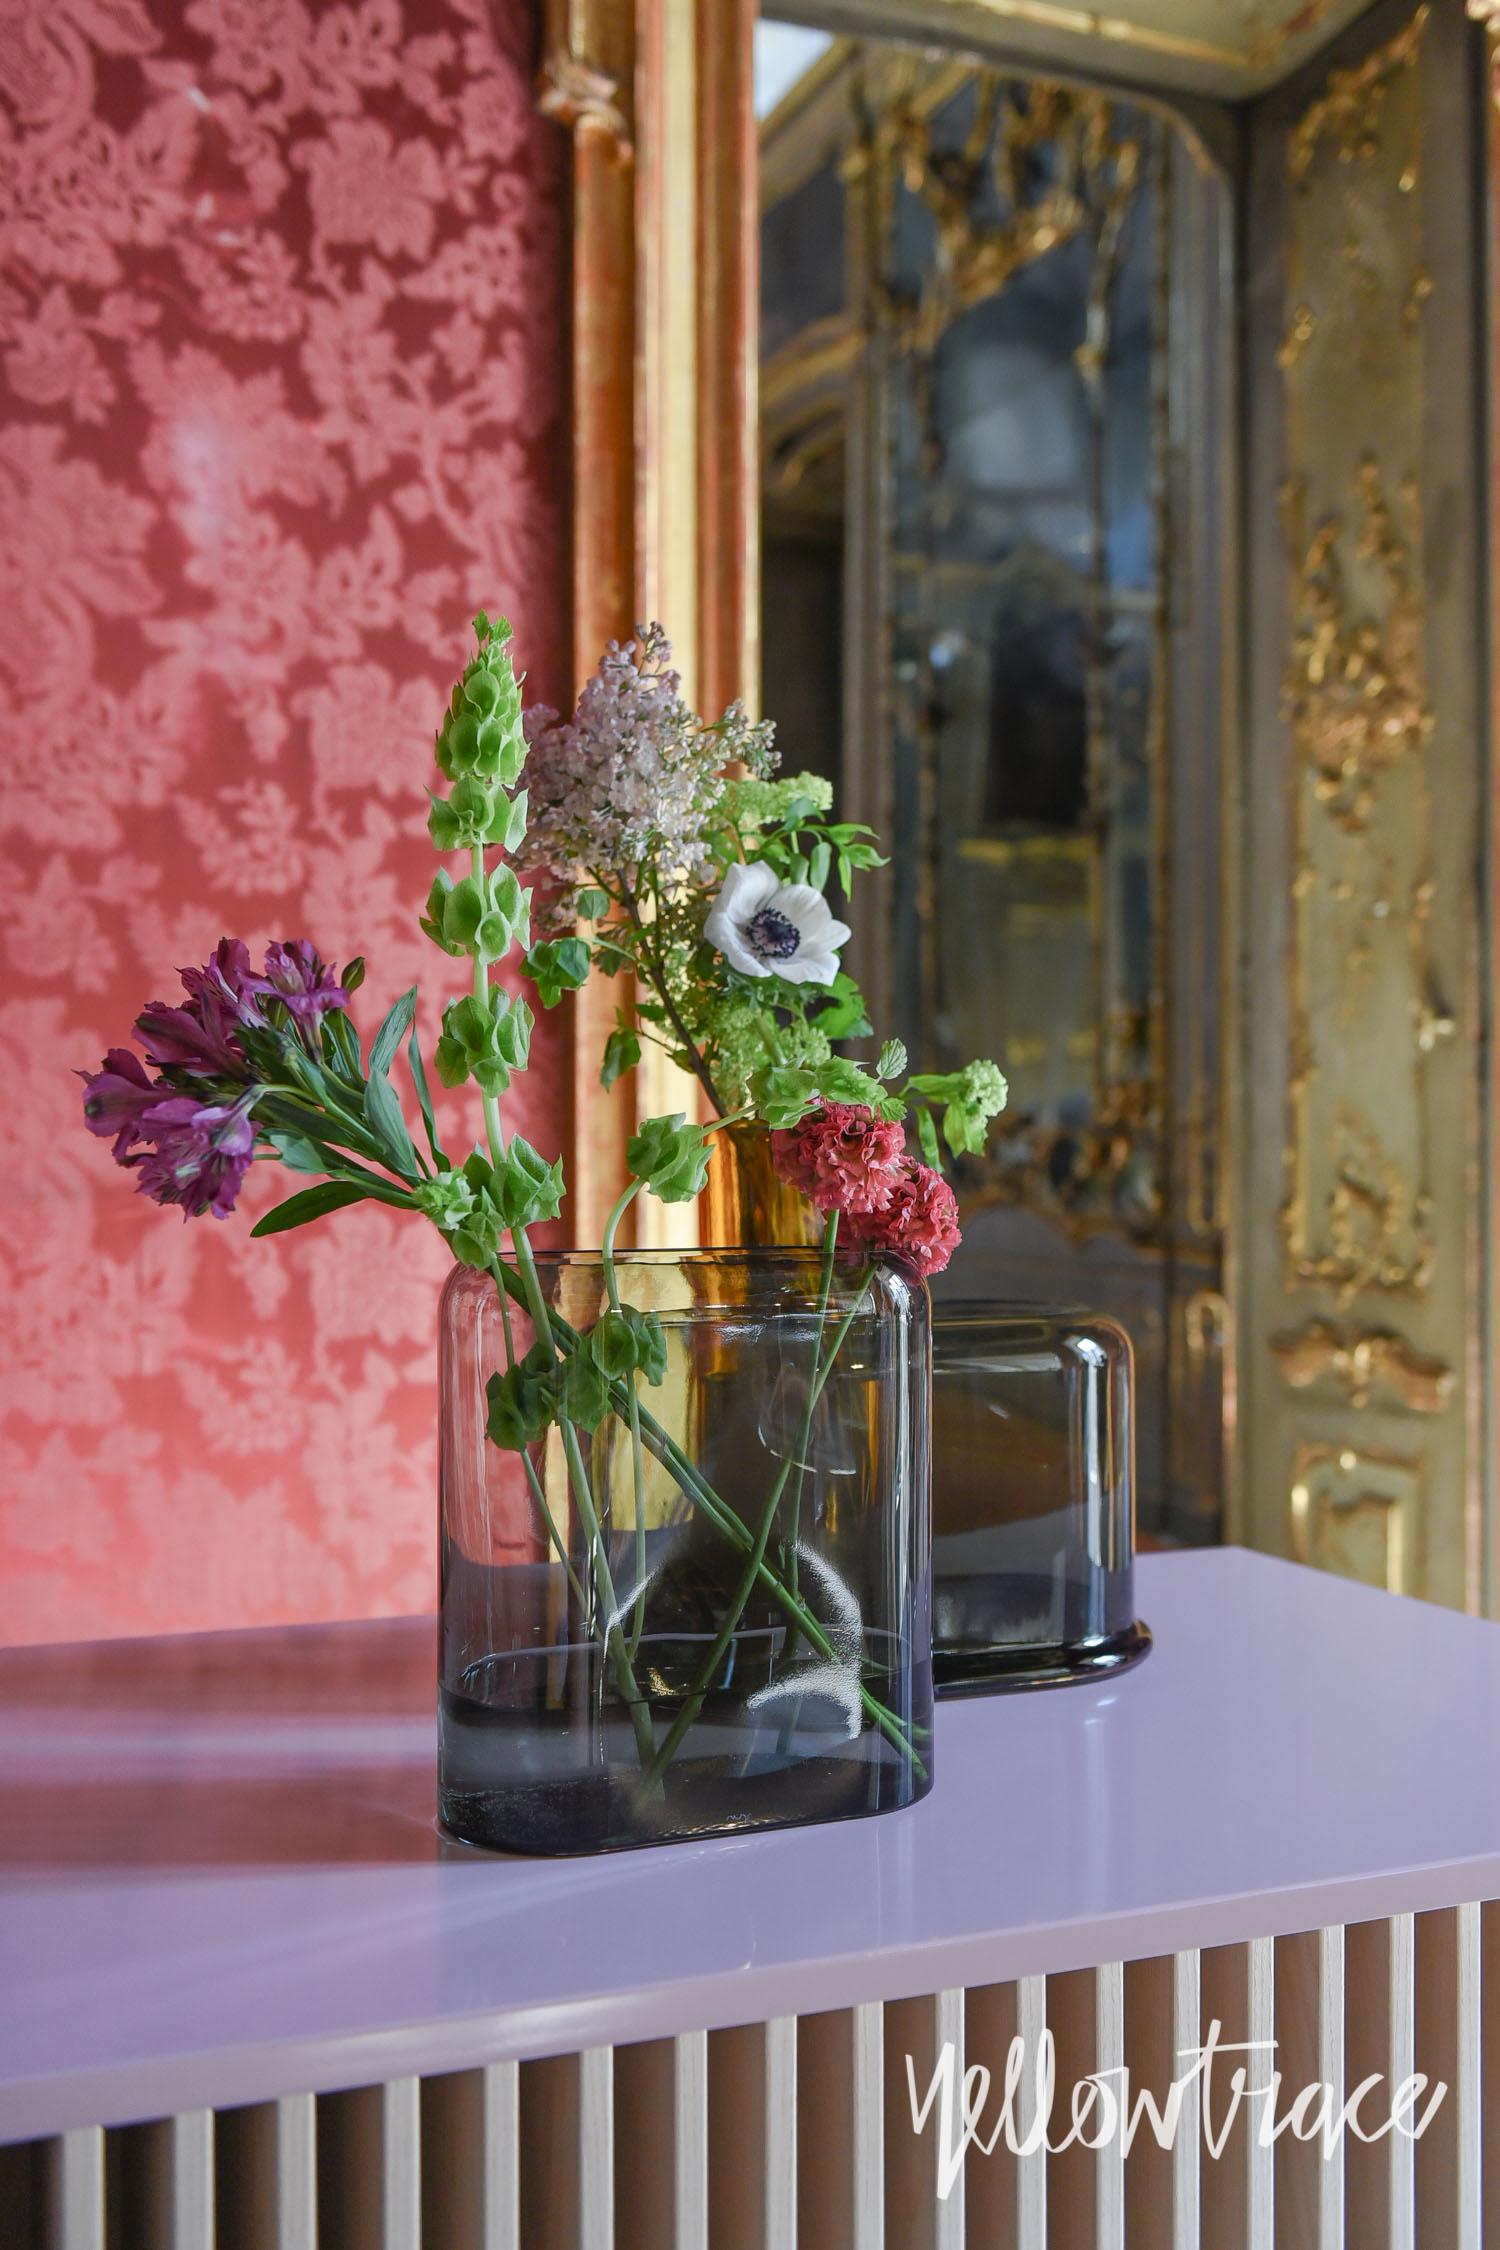 Milan Design Week 2017 Highlights, Nude Glass at Palazzo Litta, Photo © Nick Hughes | #Milantrace2017